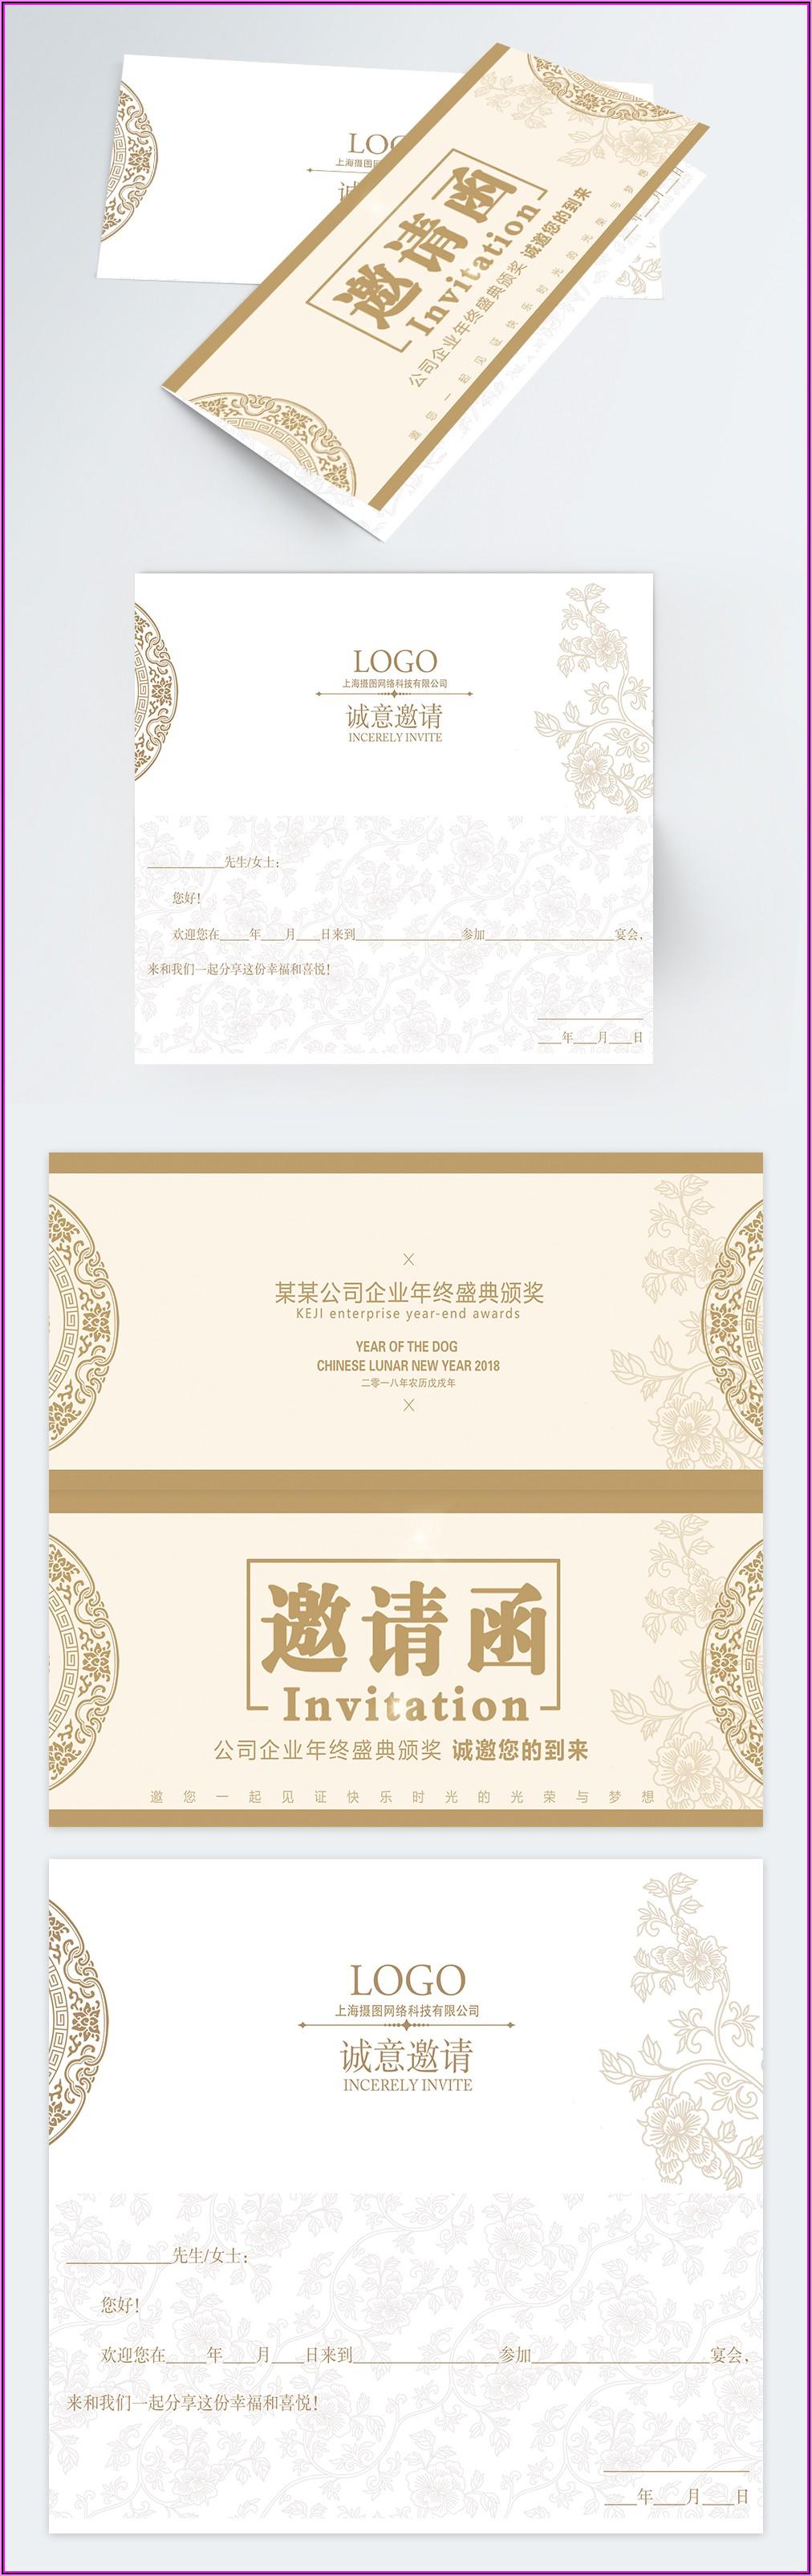 Award Ceremony Invitation Template Free